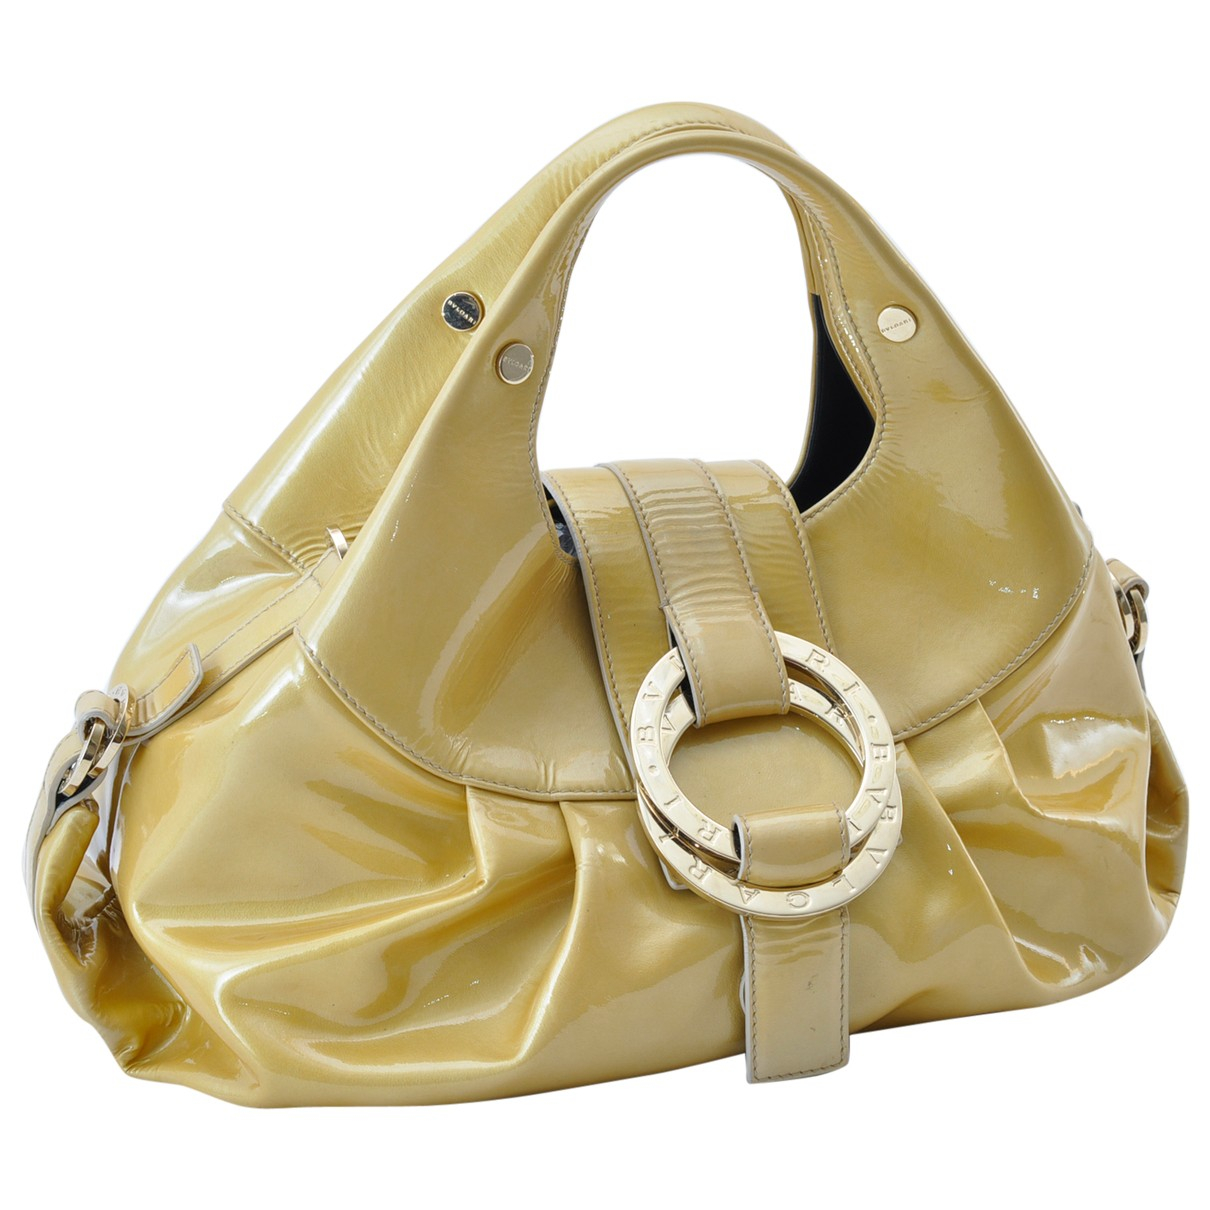 Bvlgari N Yellow Patent leather handbag for Women N